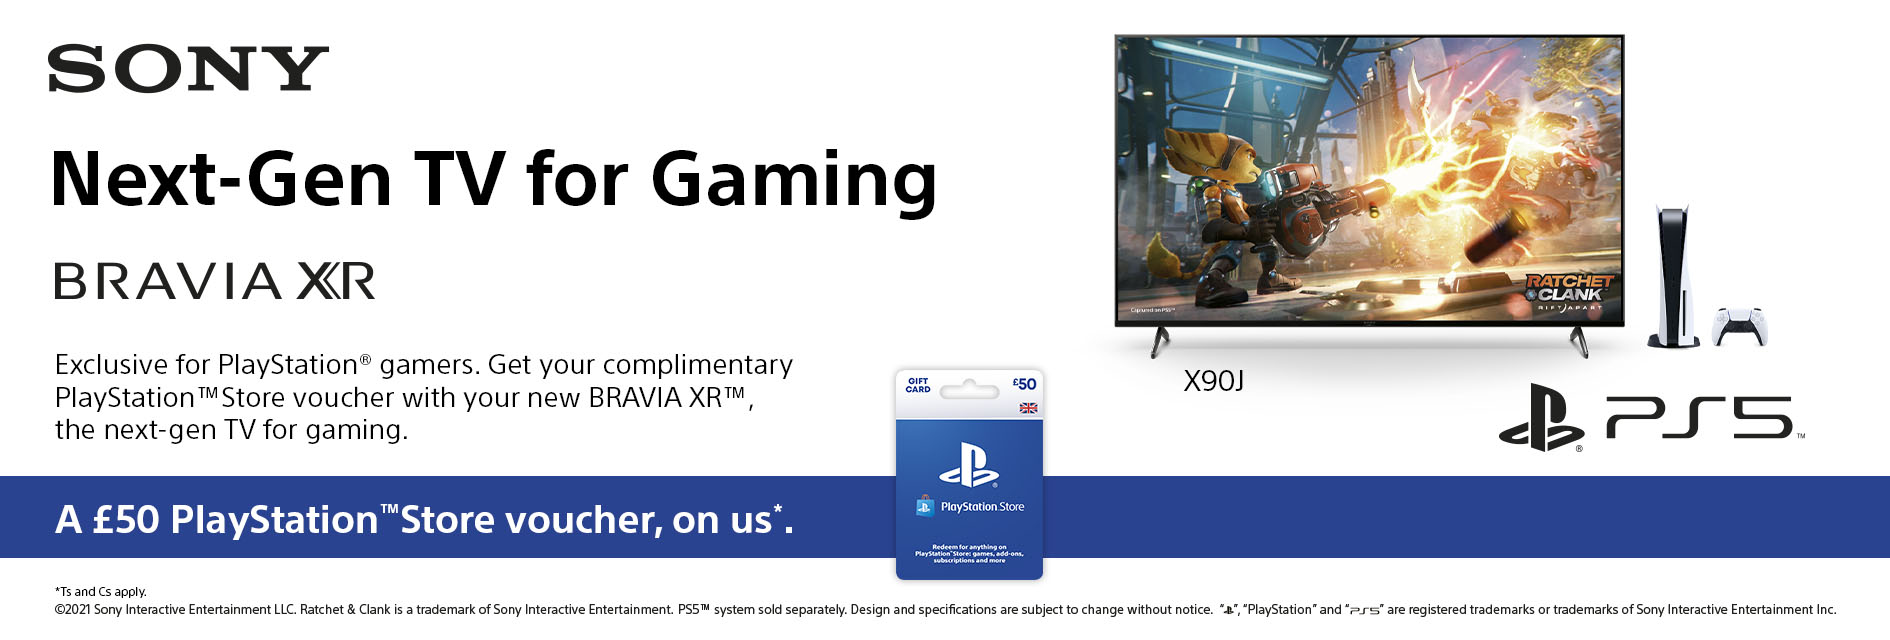 Sony playstation voucher